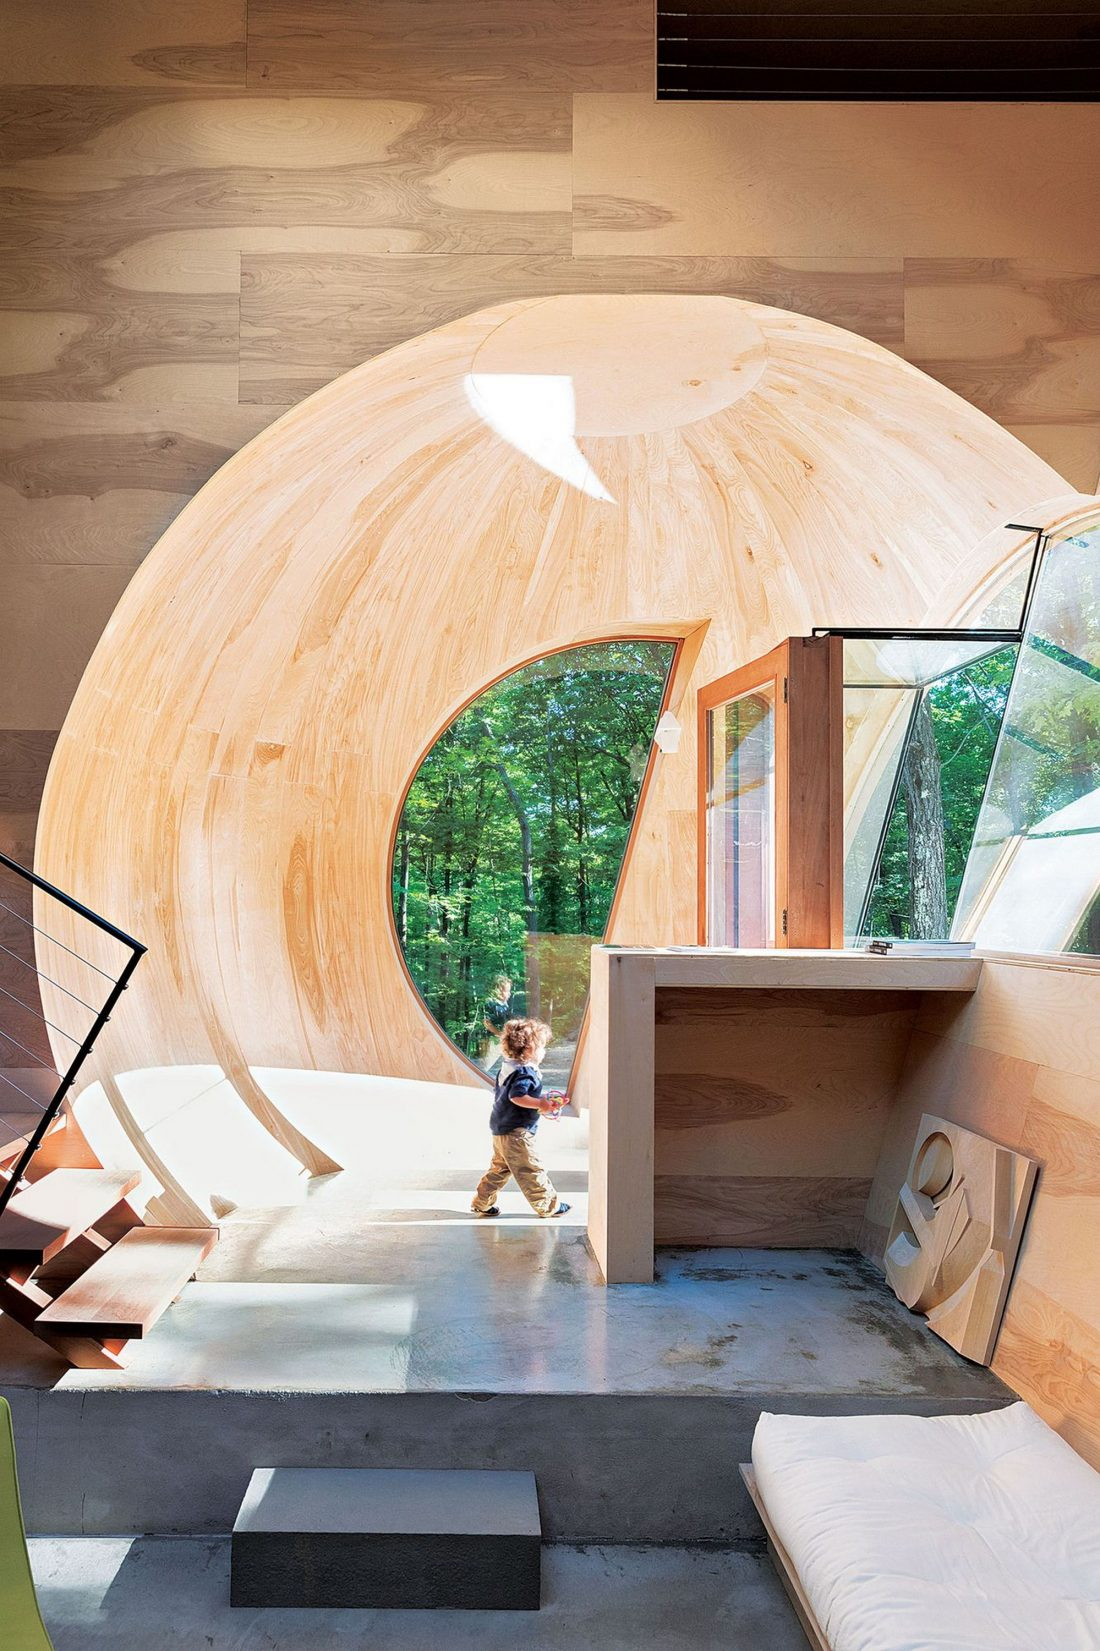 4d-gostevoj-dom-v-lesu-po-proektu-steven-holl-architects-4